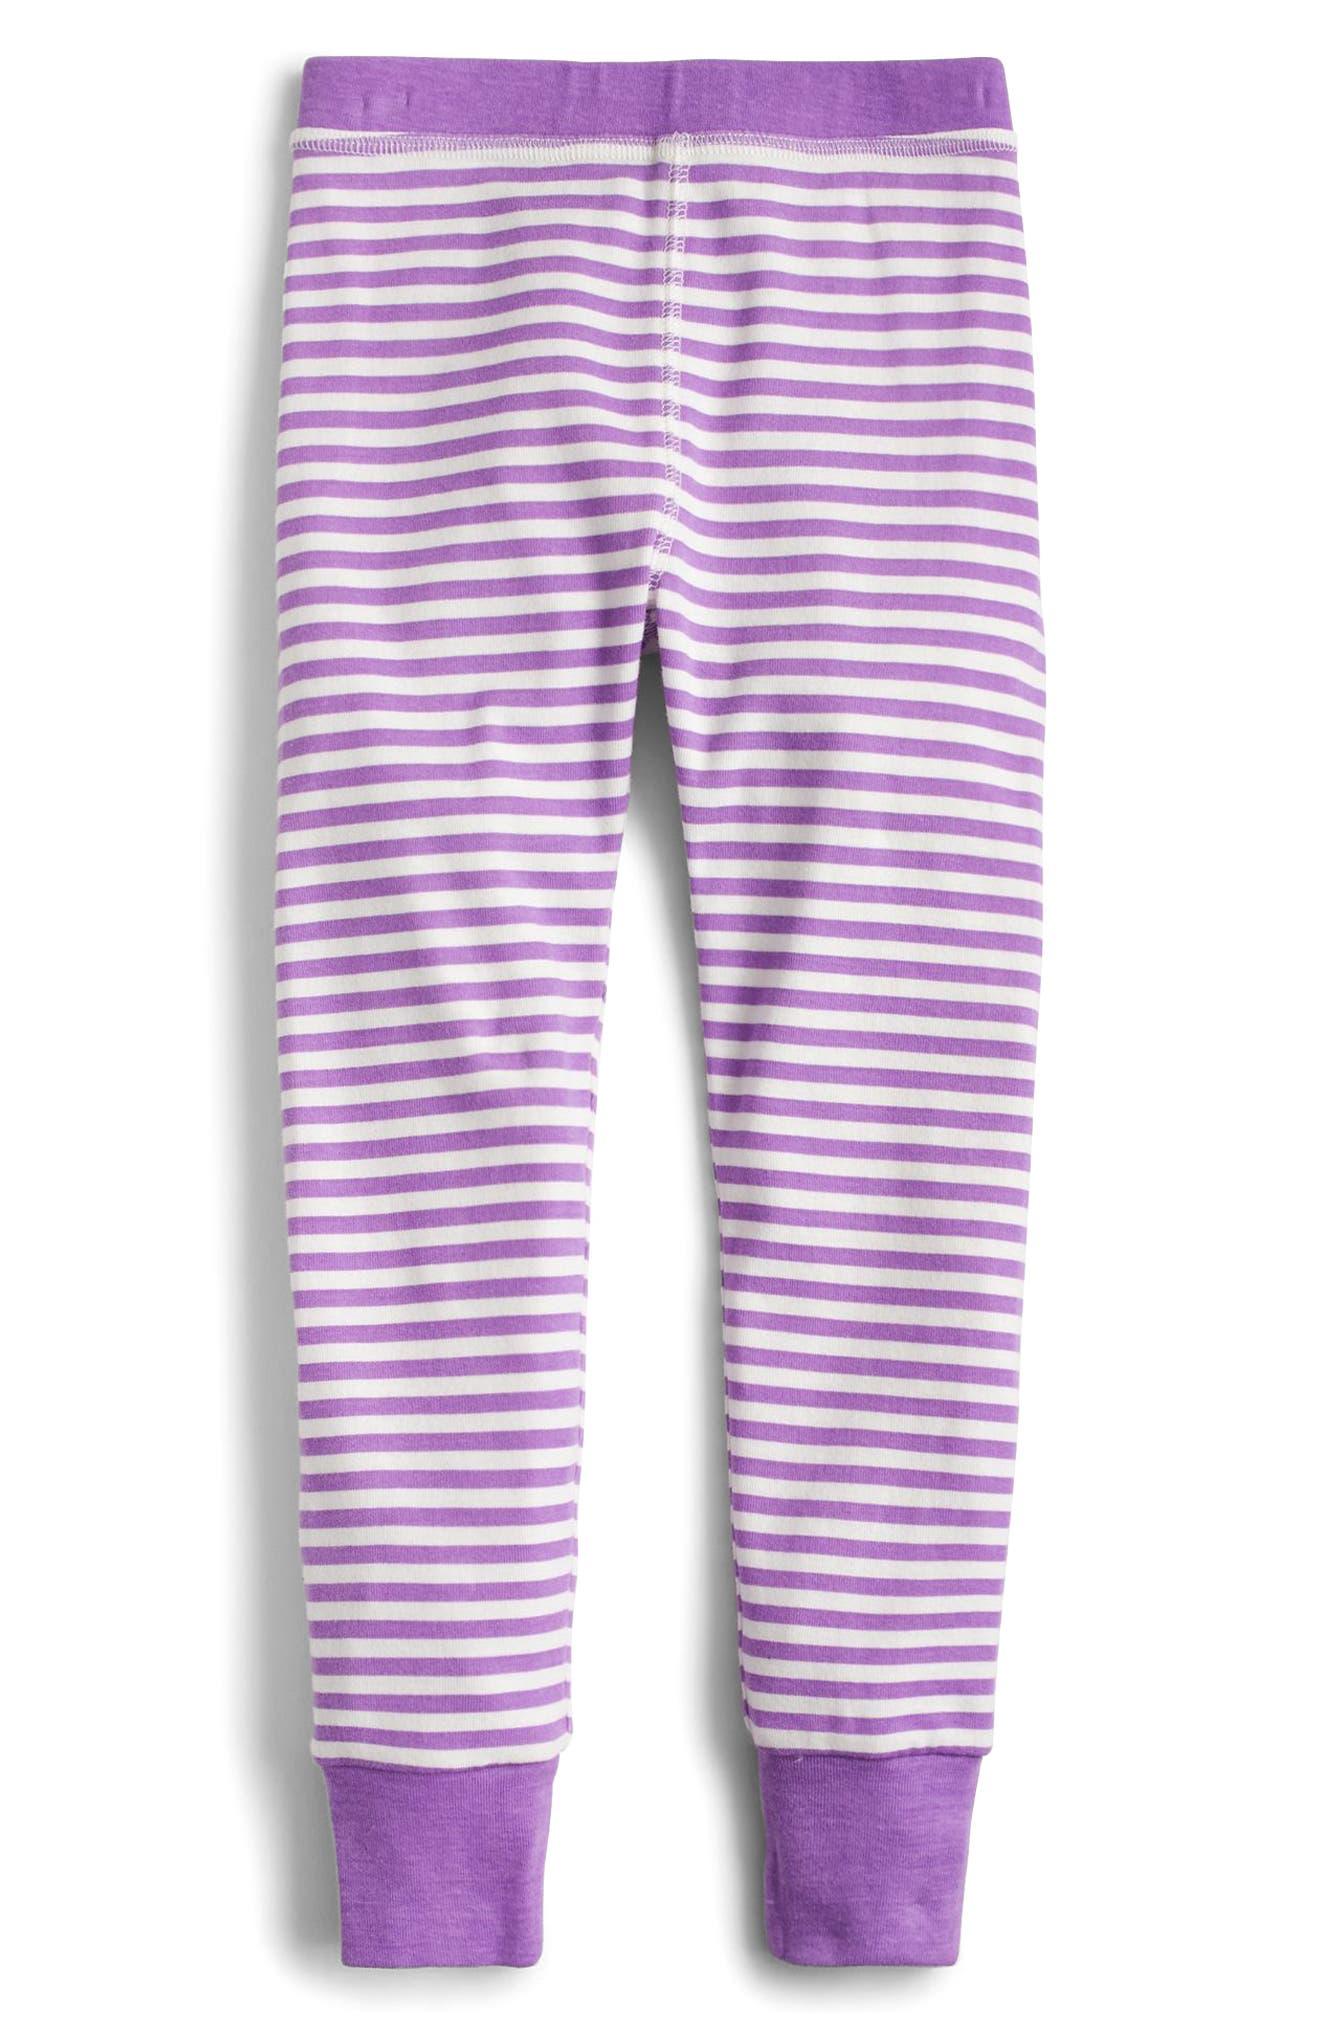 Alternate Image 3  - crewcuts by J.Crew Dot & Stripe Fitted Two-Piece Pajamas (Toddler Girls, Little Girls & Big Girls)